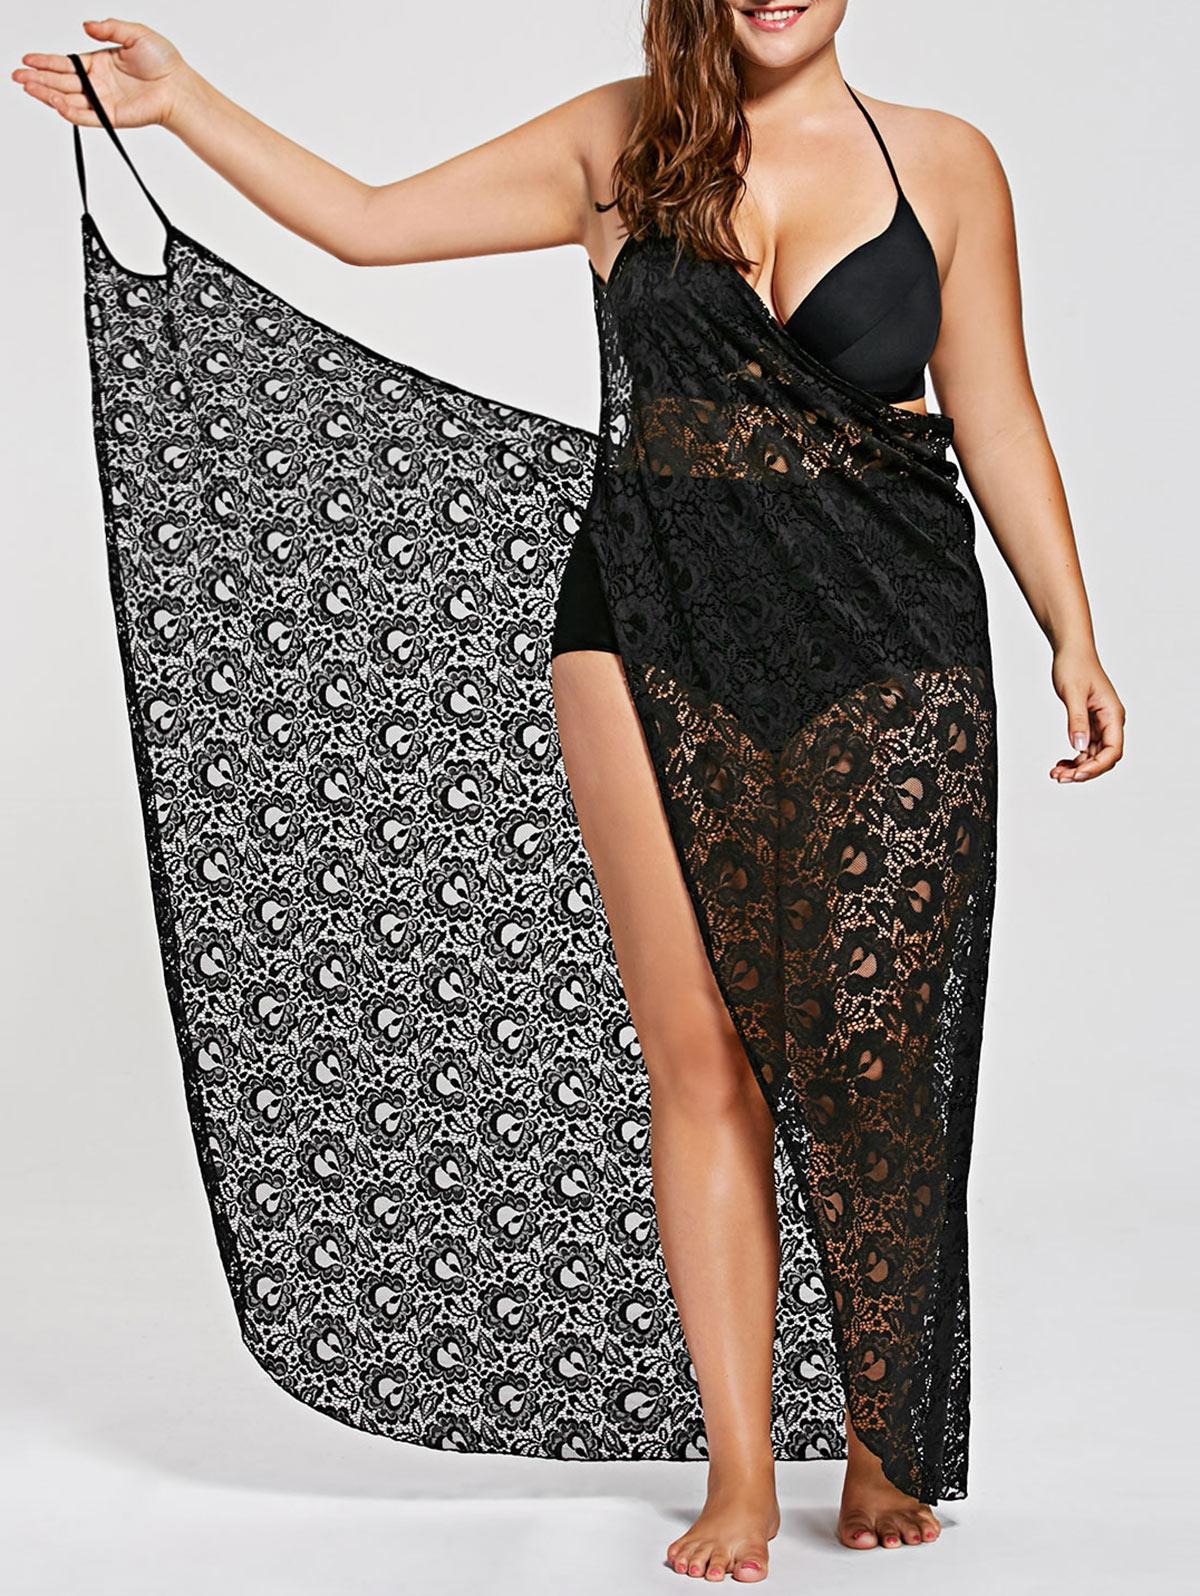 1aff118d06dc Lace Spaghetti Straps Wrap Up Beach Dress  (XL-3XL) – Thick Chick ...